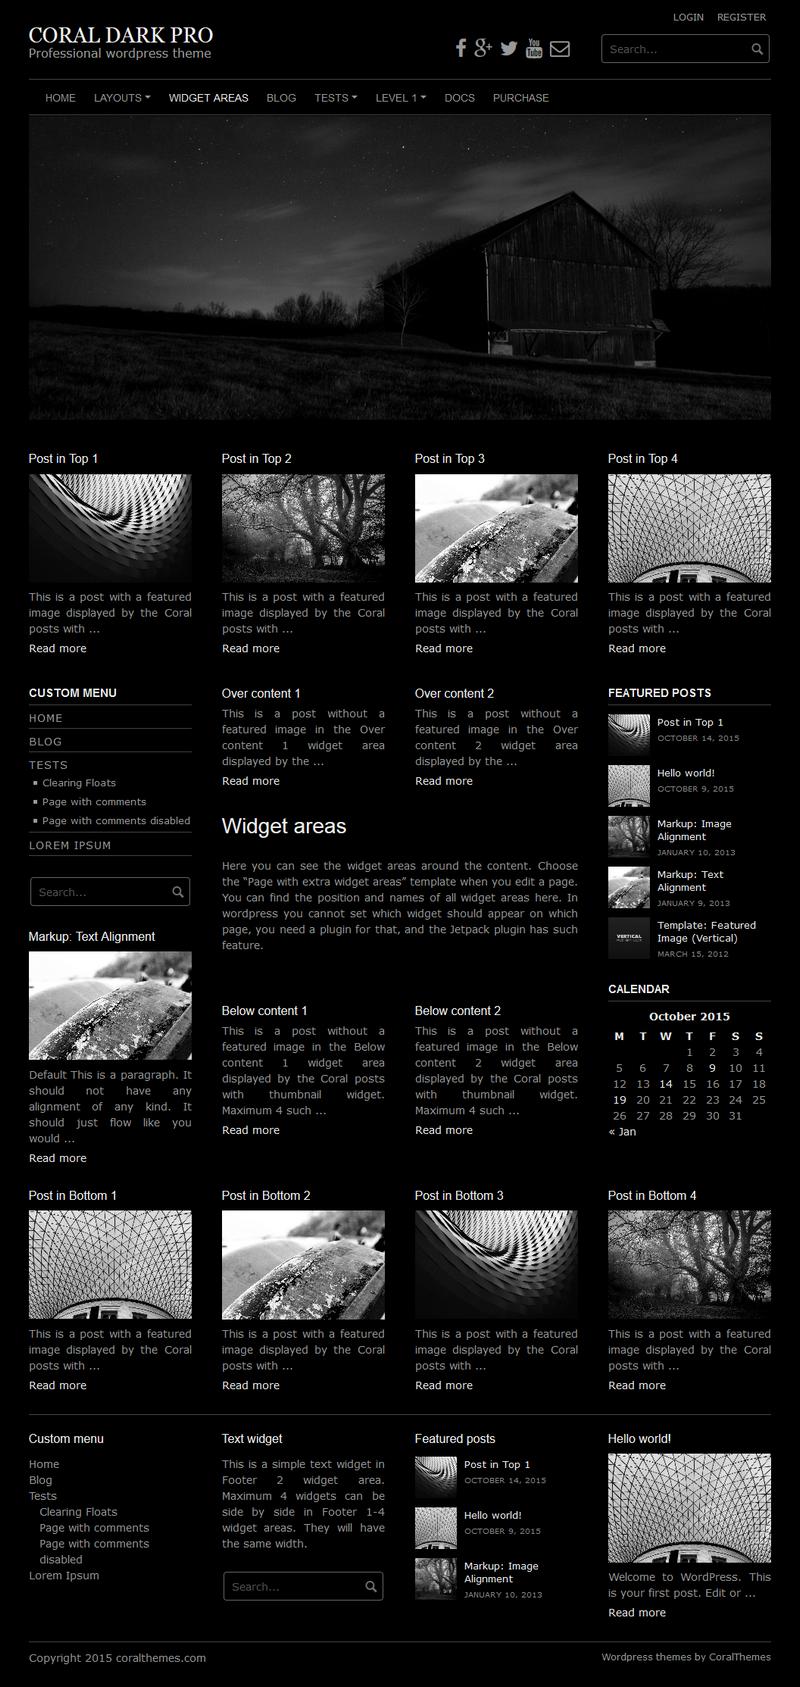 Coral Dark Pro wordpress theme